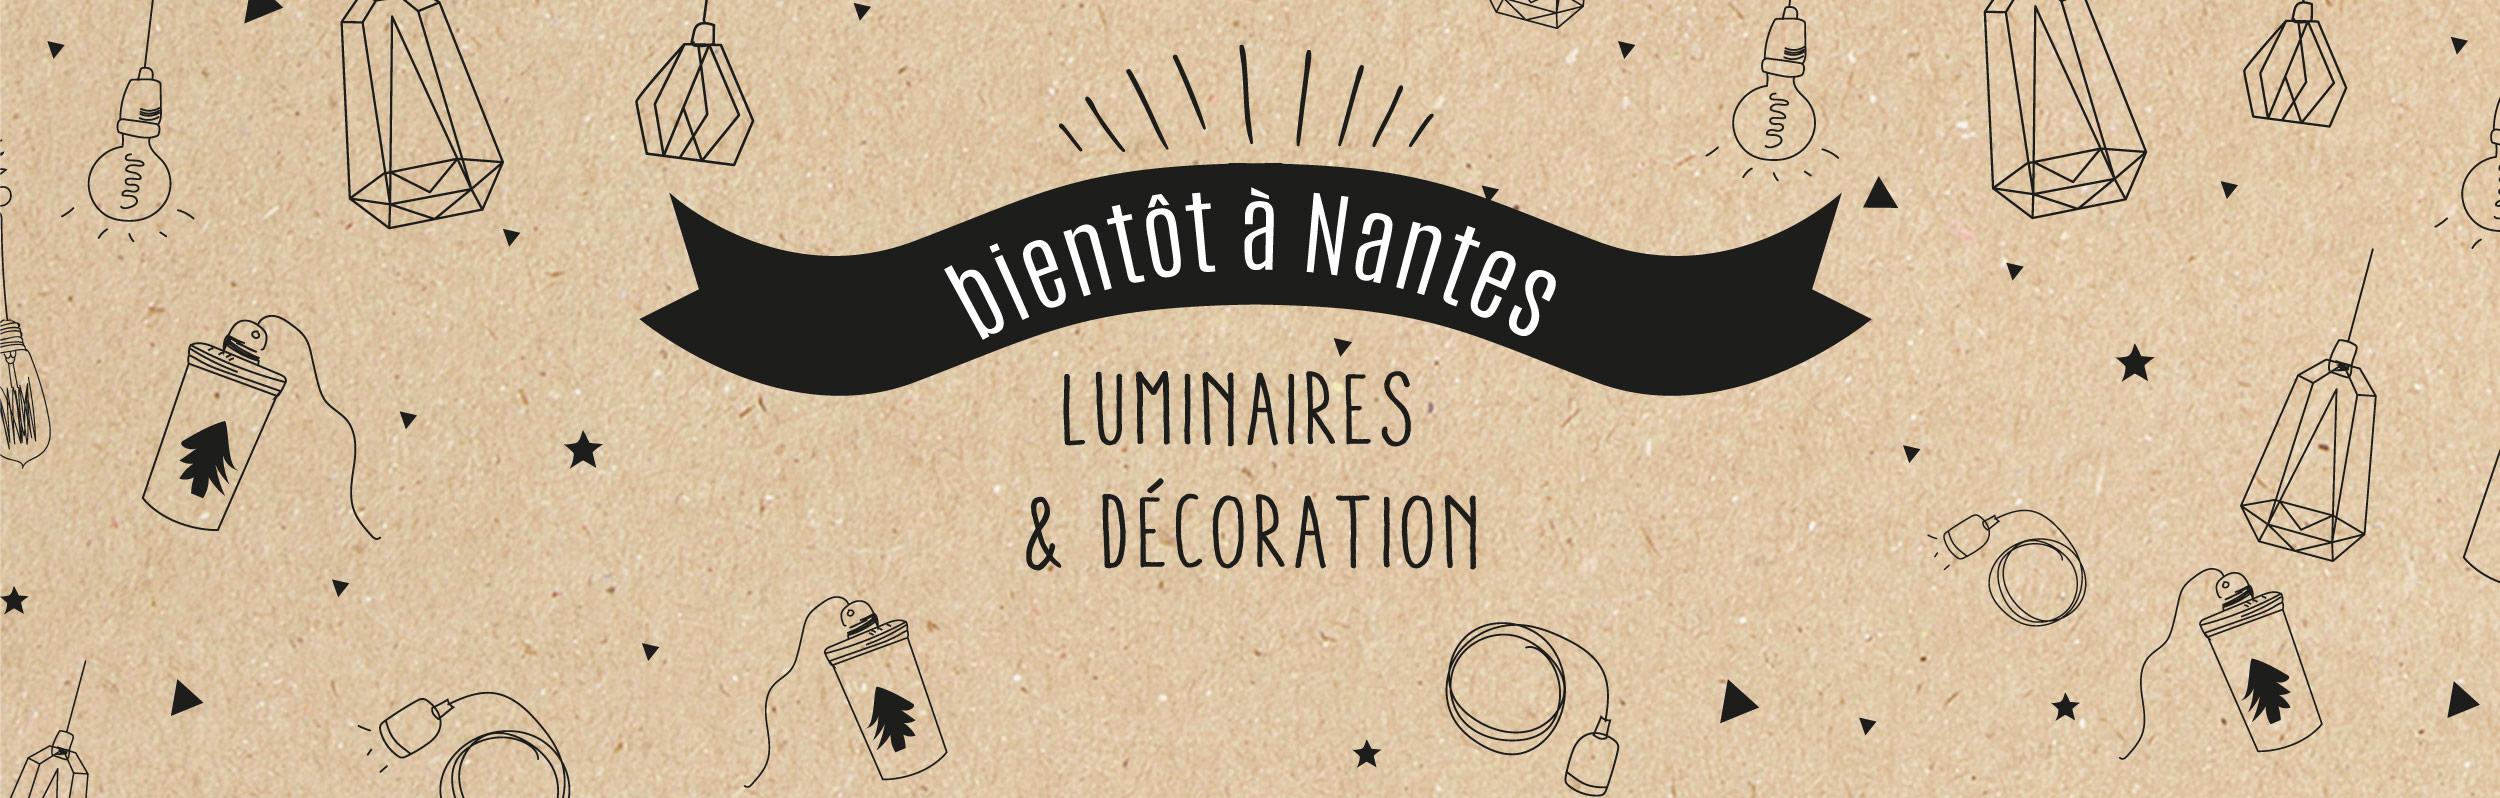 bandeau facebook decoration nantes